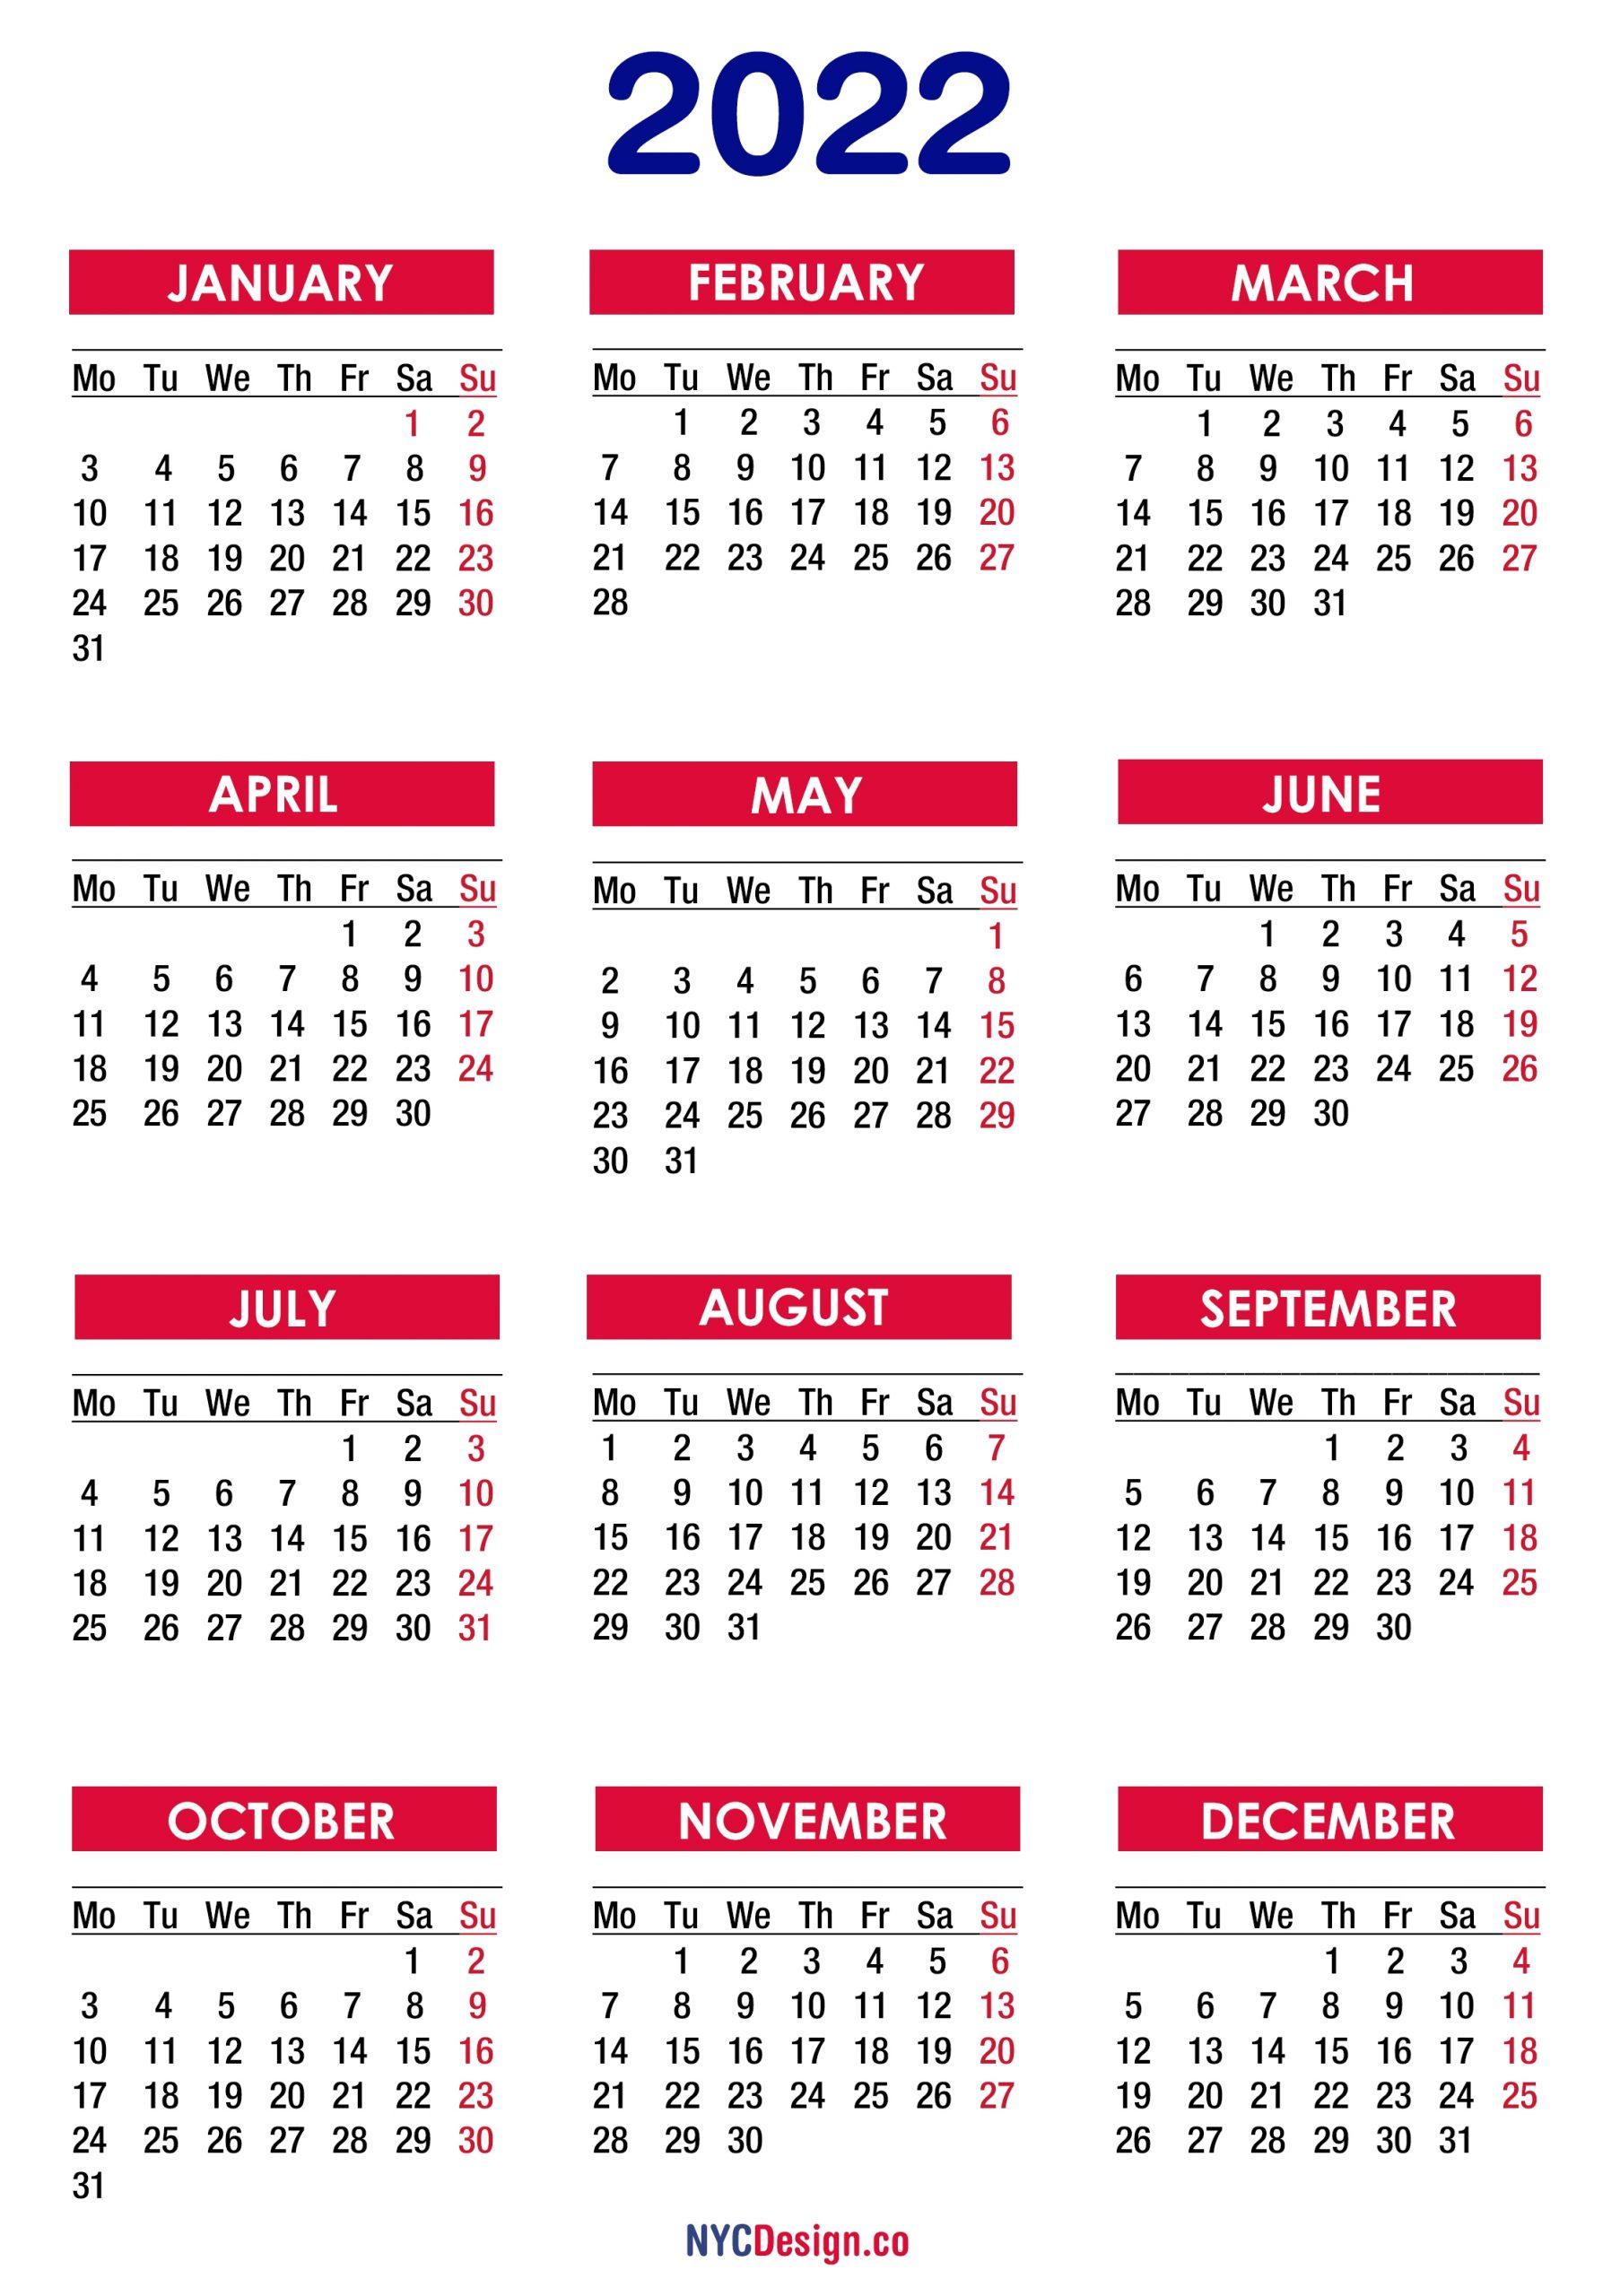 2022 calendar printable free pdf colorful monday start nycdesignco calendars printable free::Download 2022 Printable Calendar